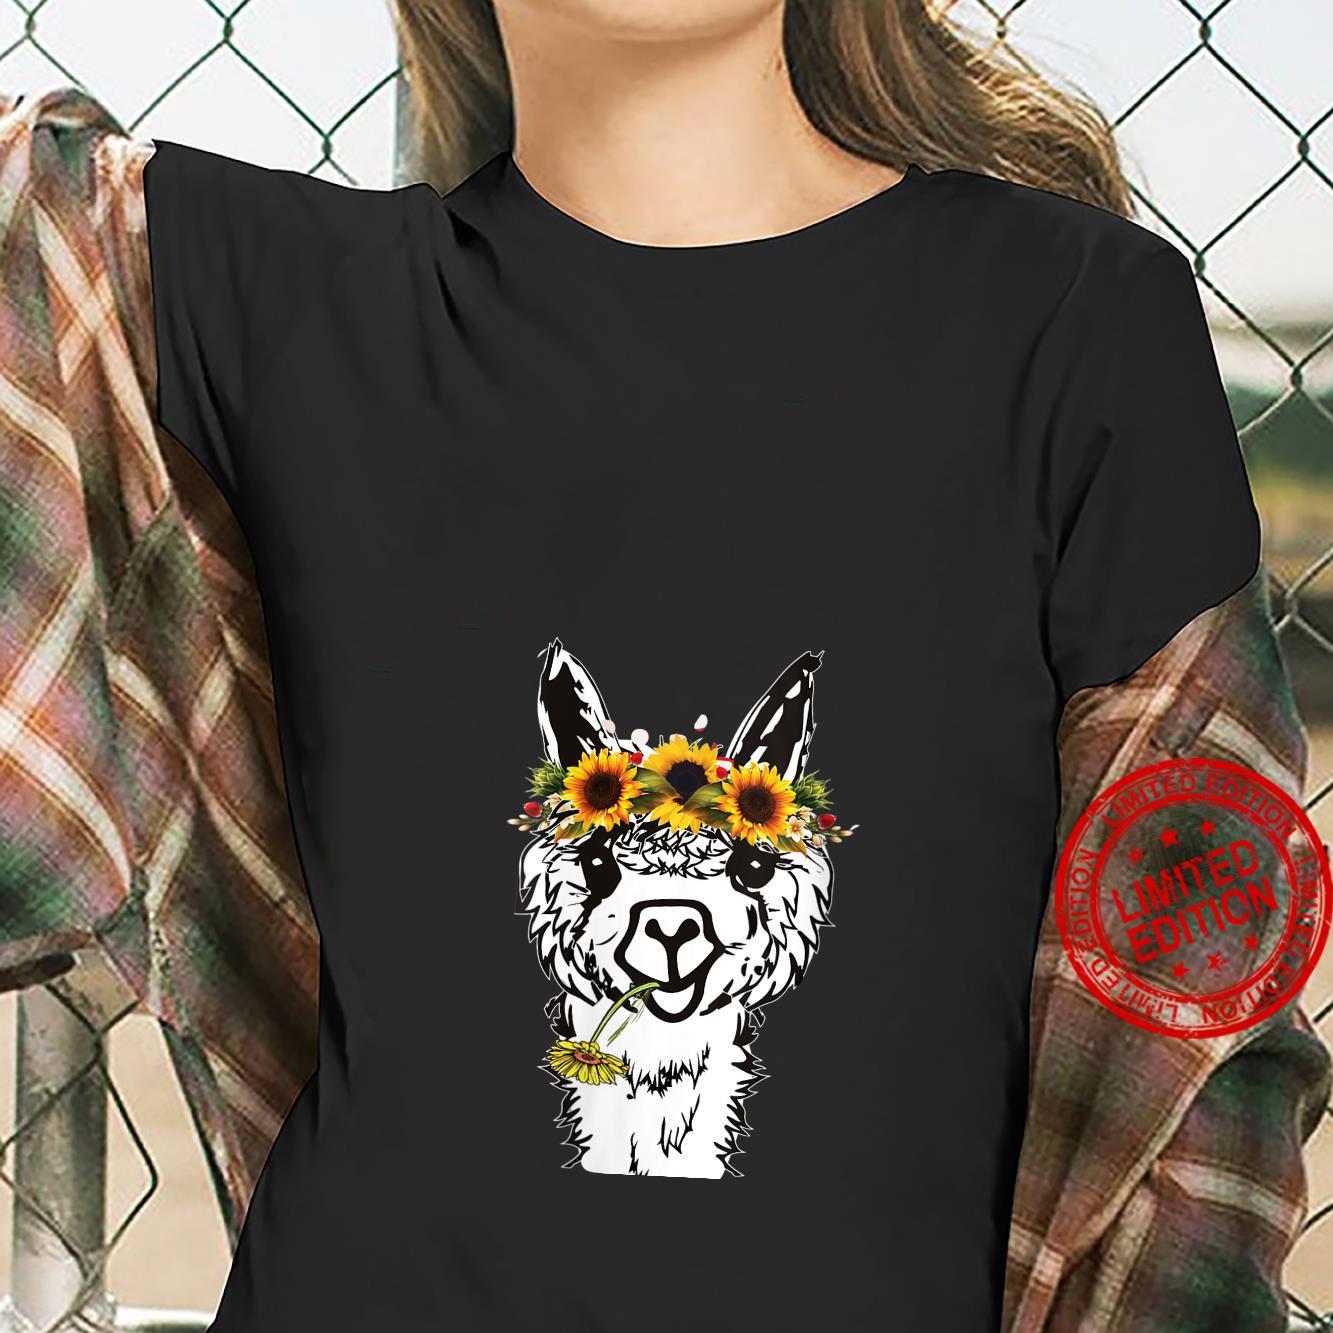 Womens's Llama Sunflower Head Bandana Llama Alpacas Shirt ladies tee